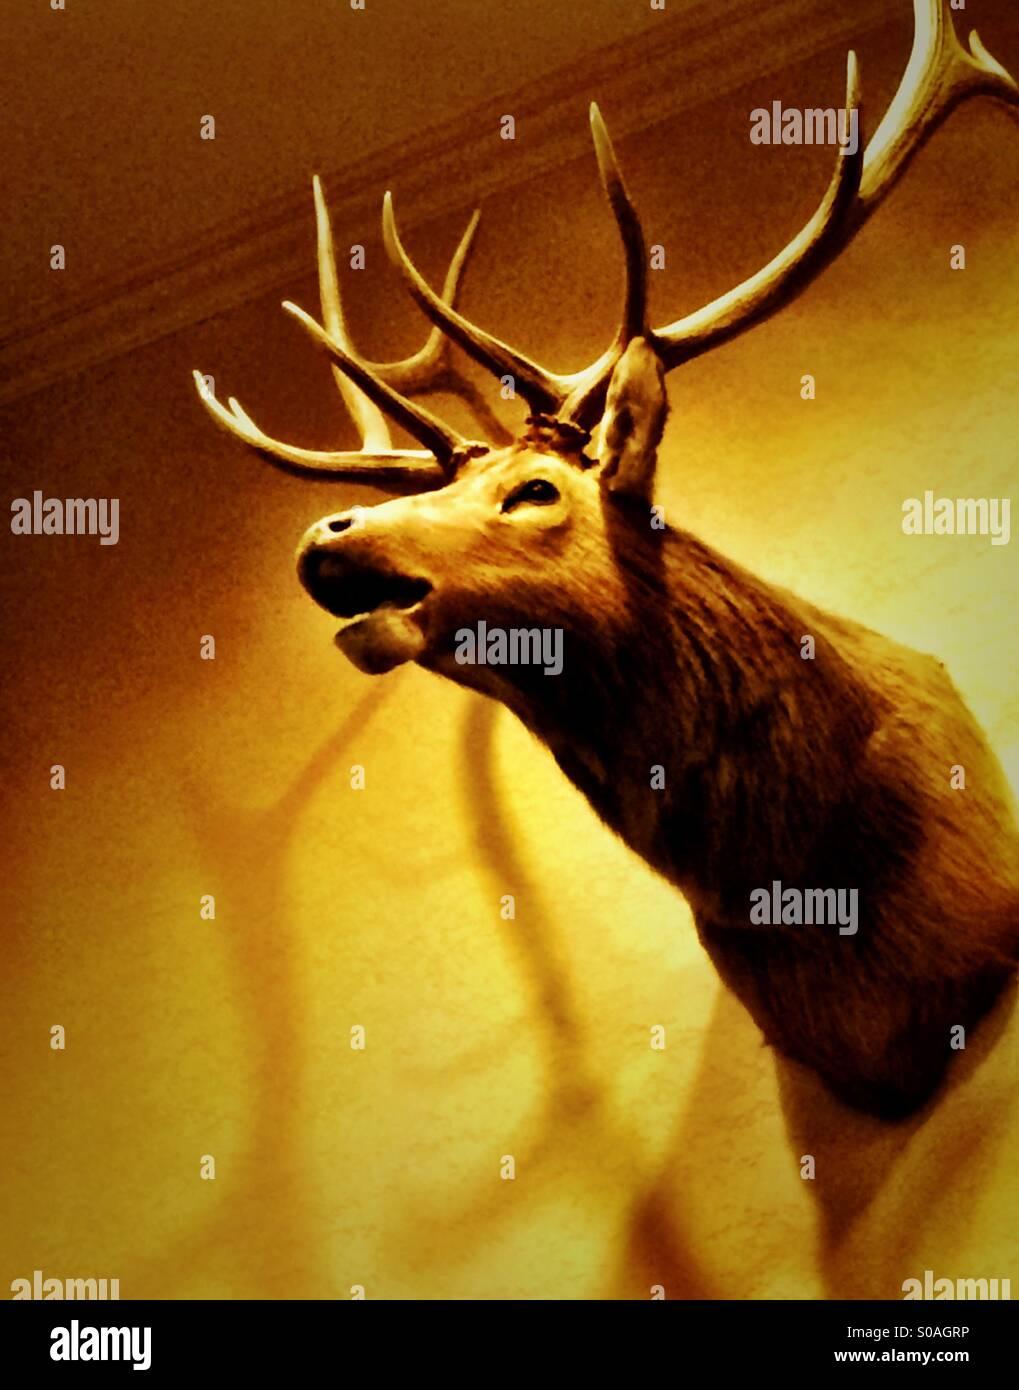 Stuffed stag head on wall Stock Photo: 310019354 - Alamy